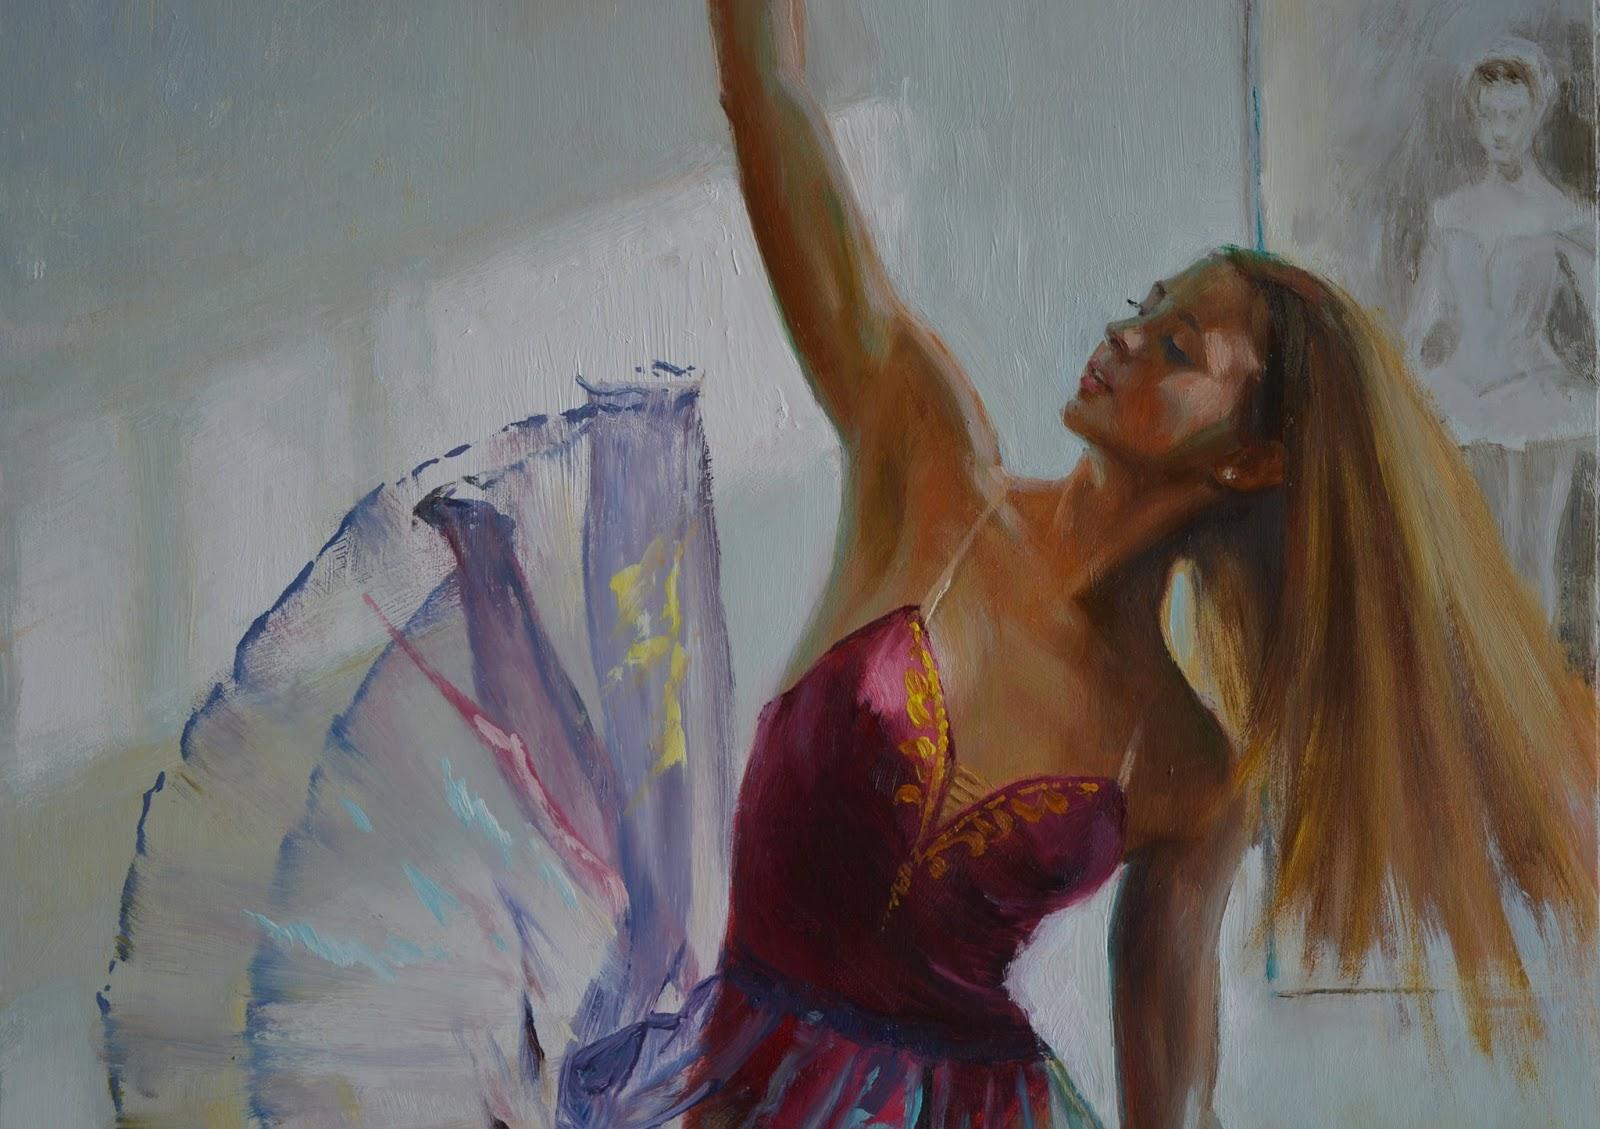 Gulyás László - Pinturas de bailarinas